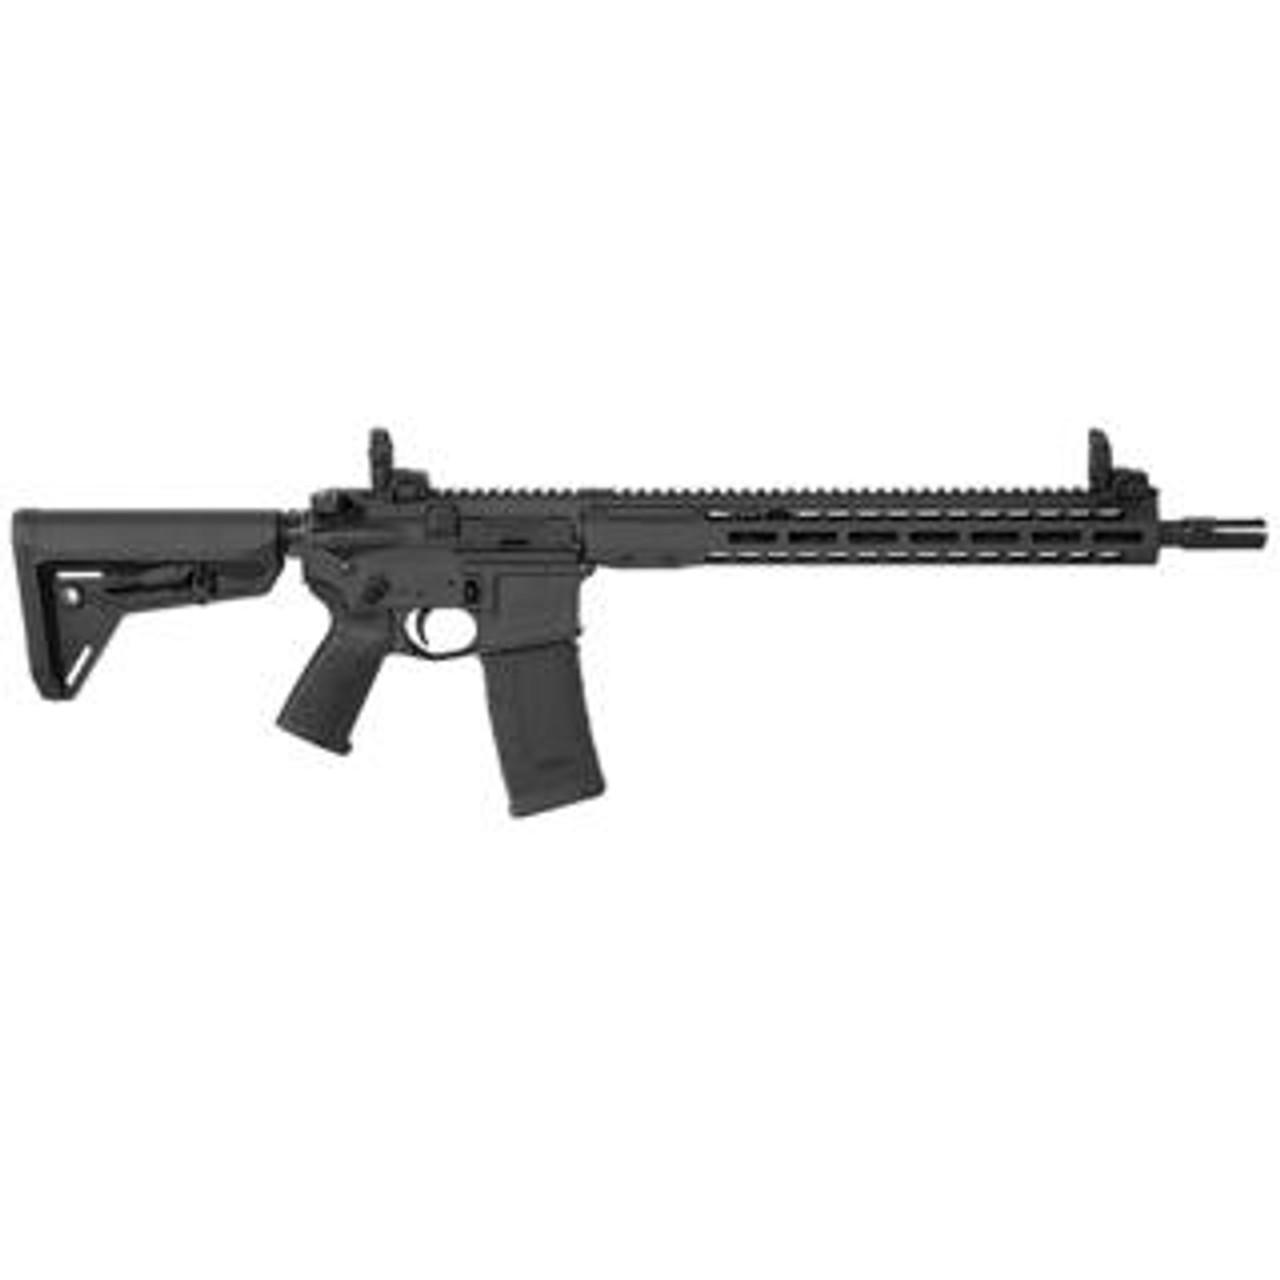 Barrett REC7 DI Carbine CALIFORNIA LEGAL - 6.8 SPC